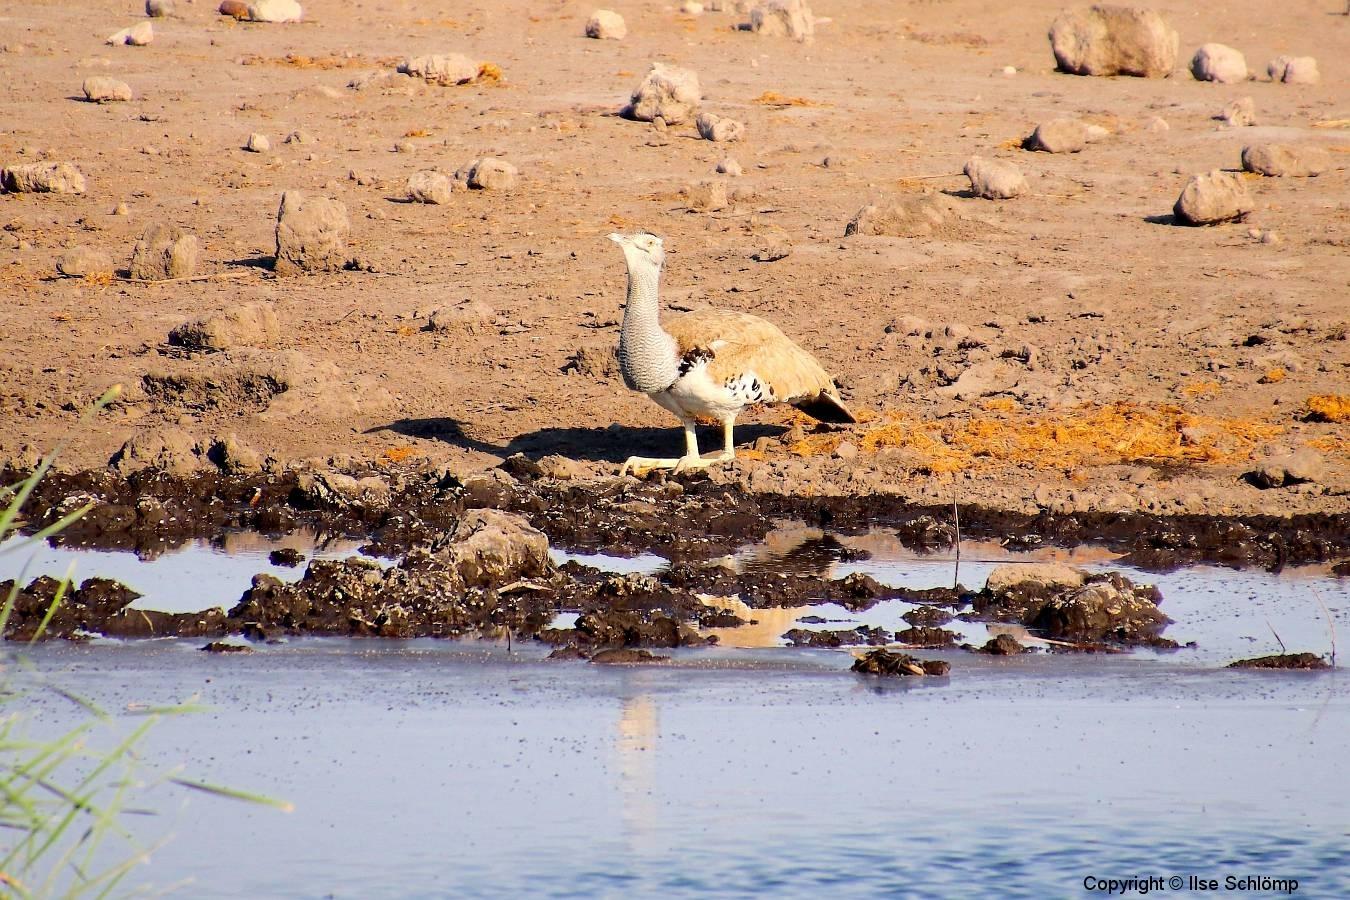 Namibia, Etosha Nationalpark, Riesentrappe am Wasserloch